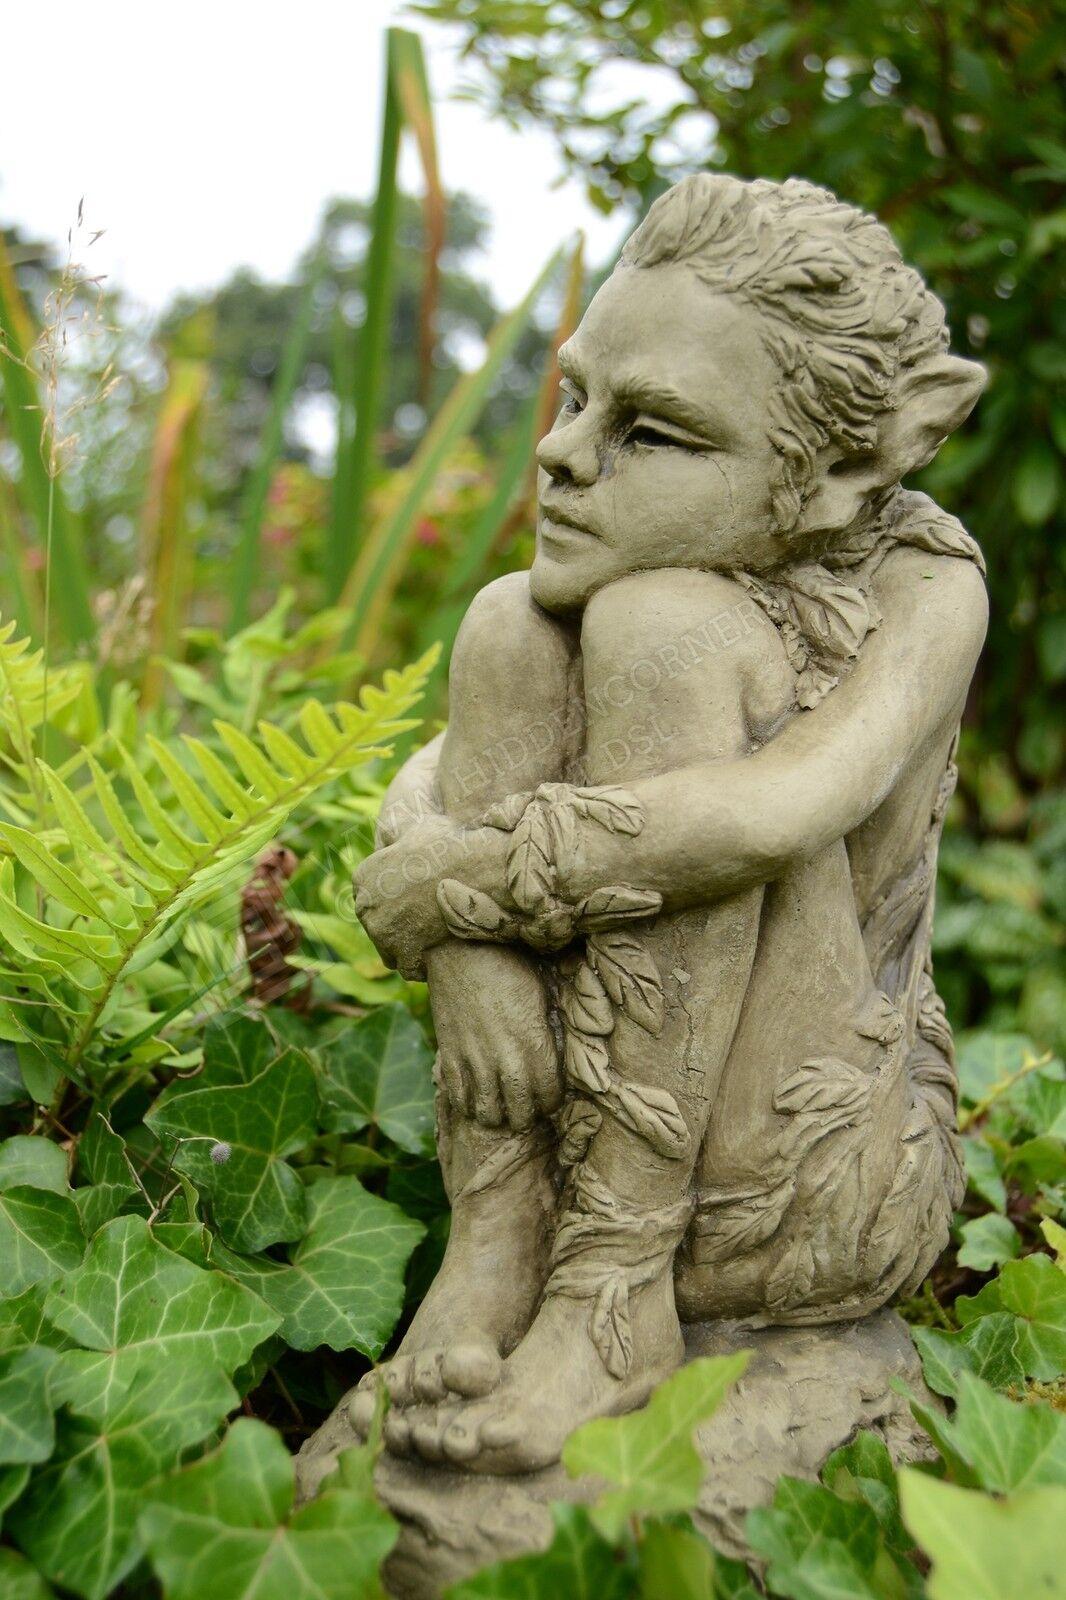 Ivy Fairy Garden Ornament Gargoyle Sculpture Stone Statue